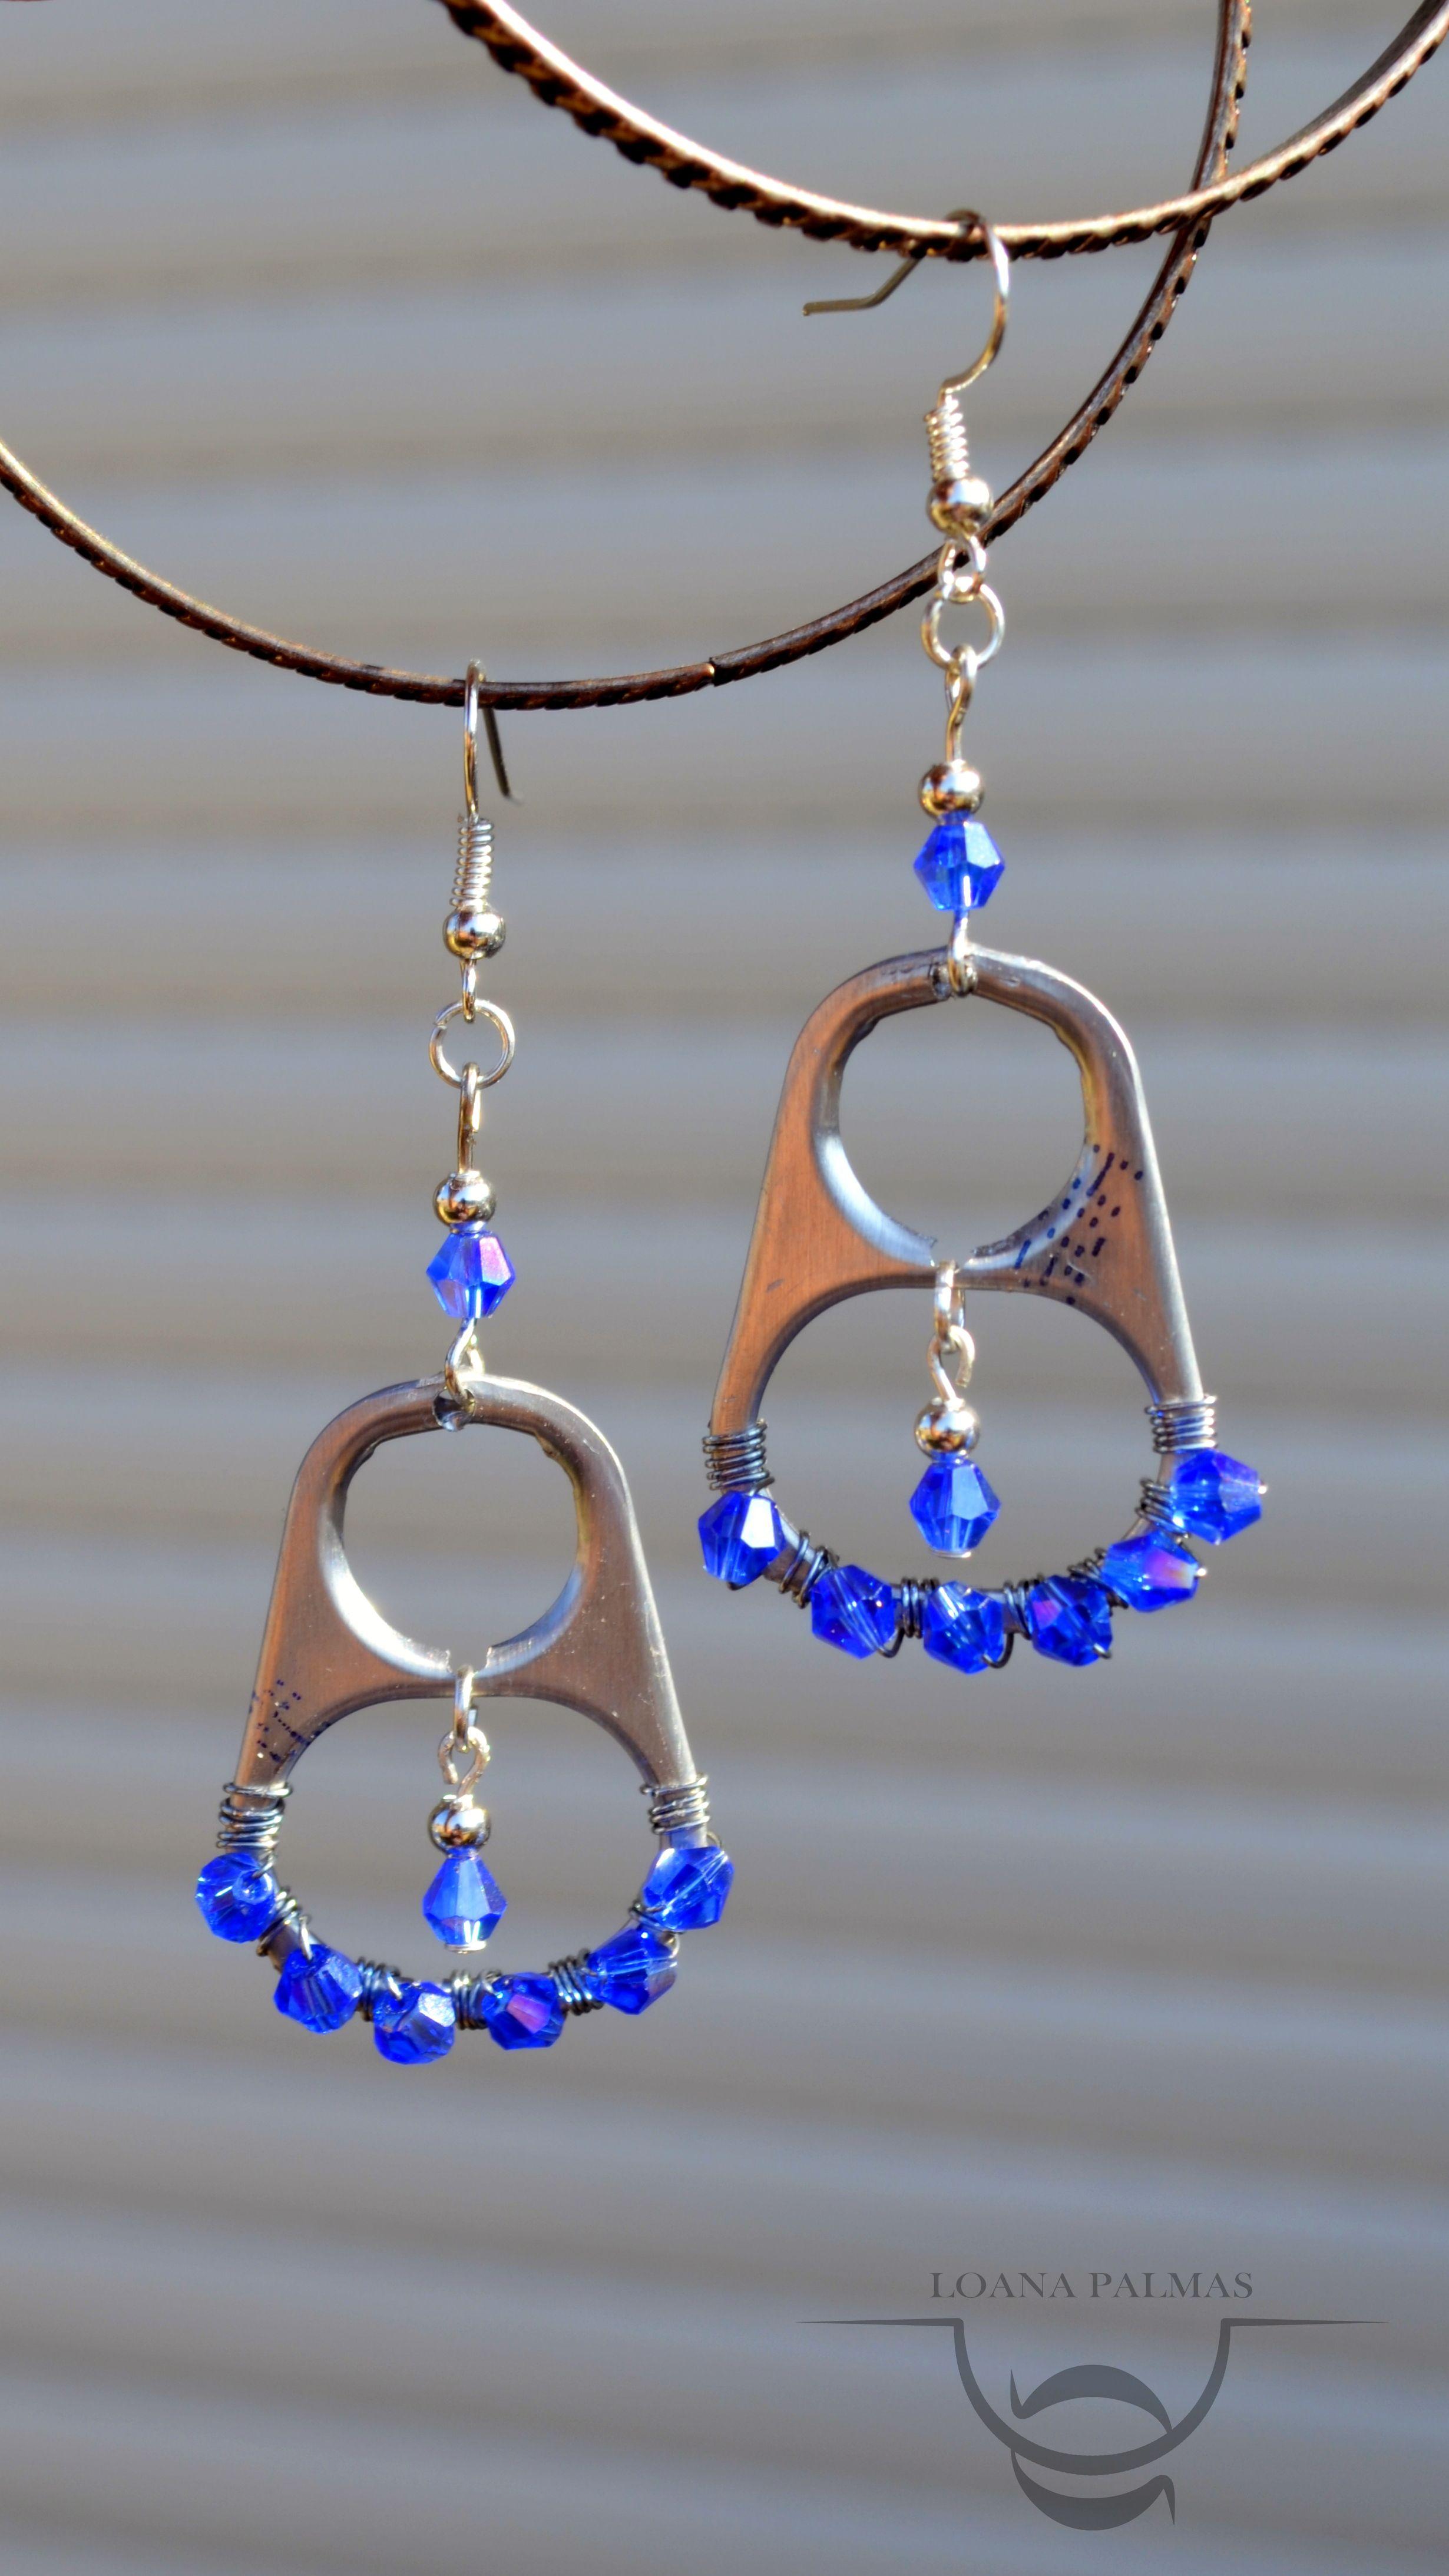 65b6085b35b2 Aretes de fichas con rombo azul